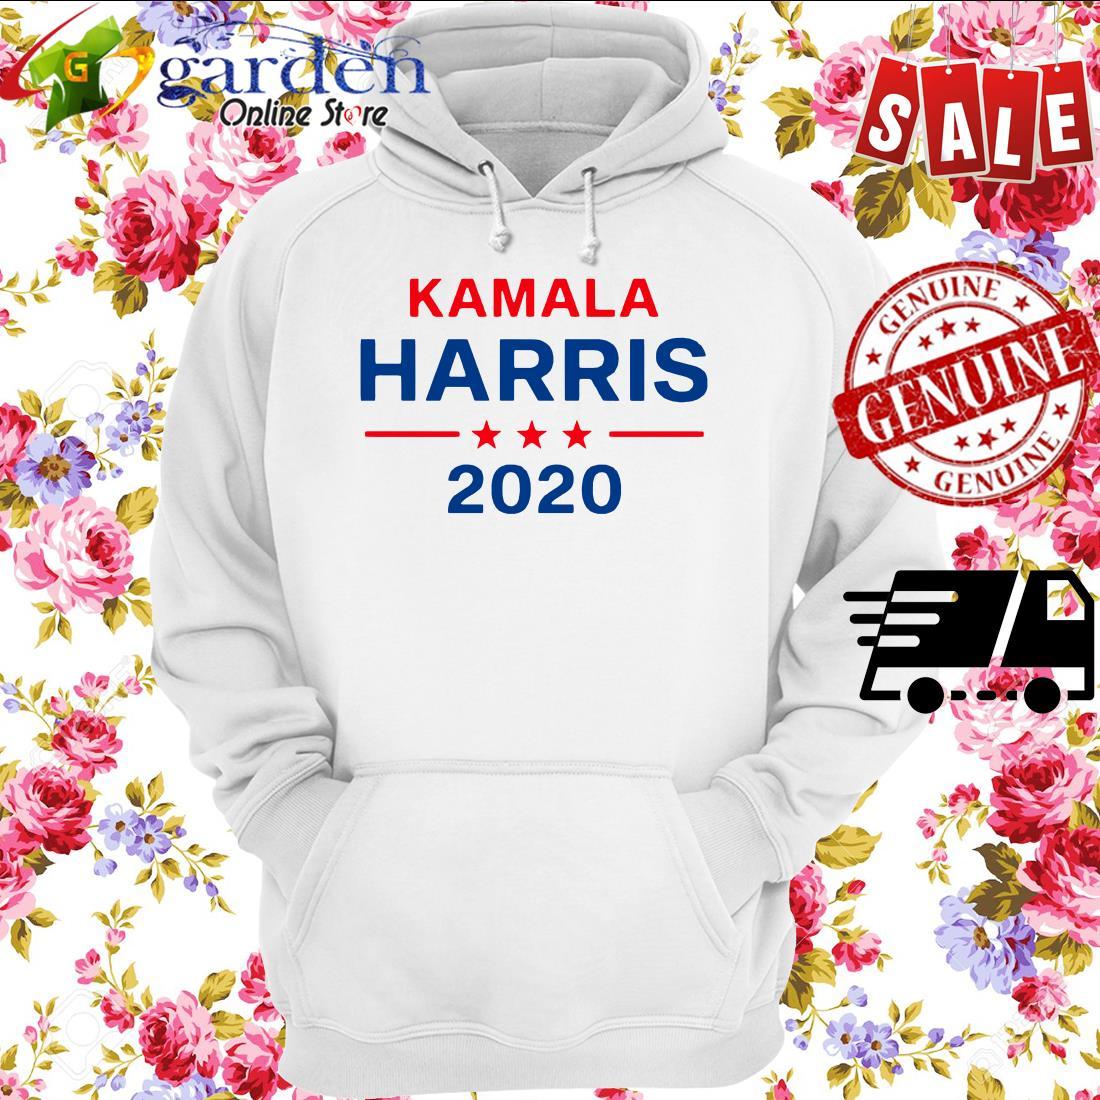 Kamala Harris 2020 star hoodie